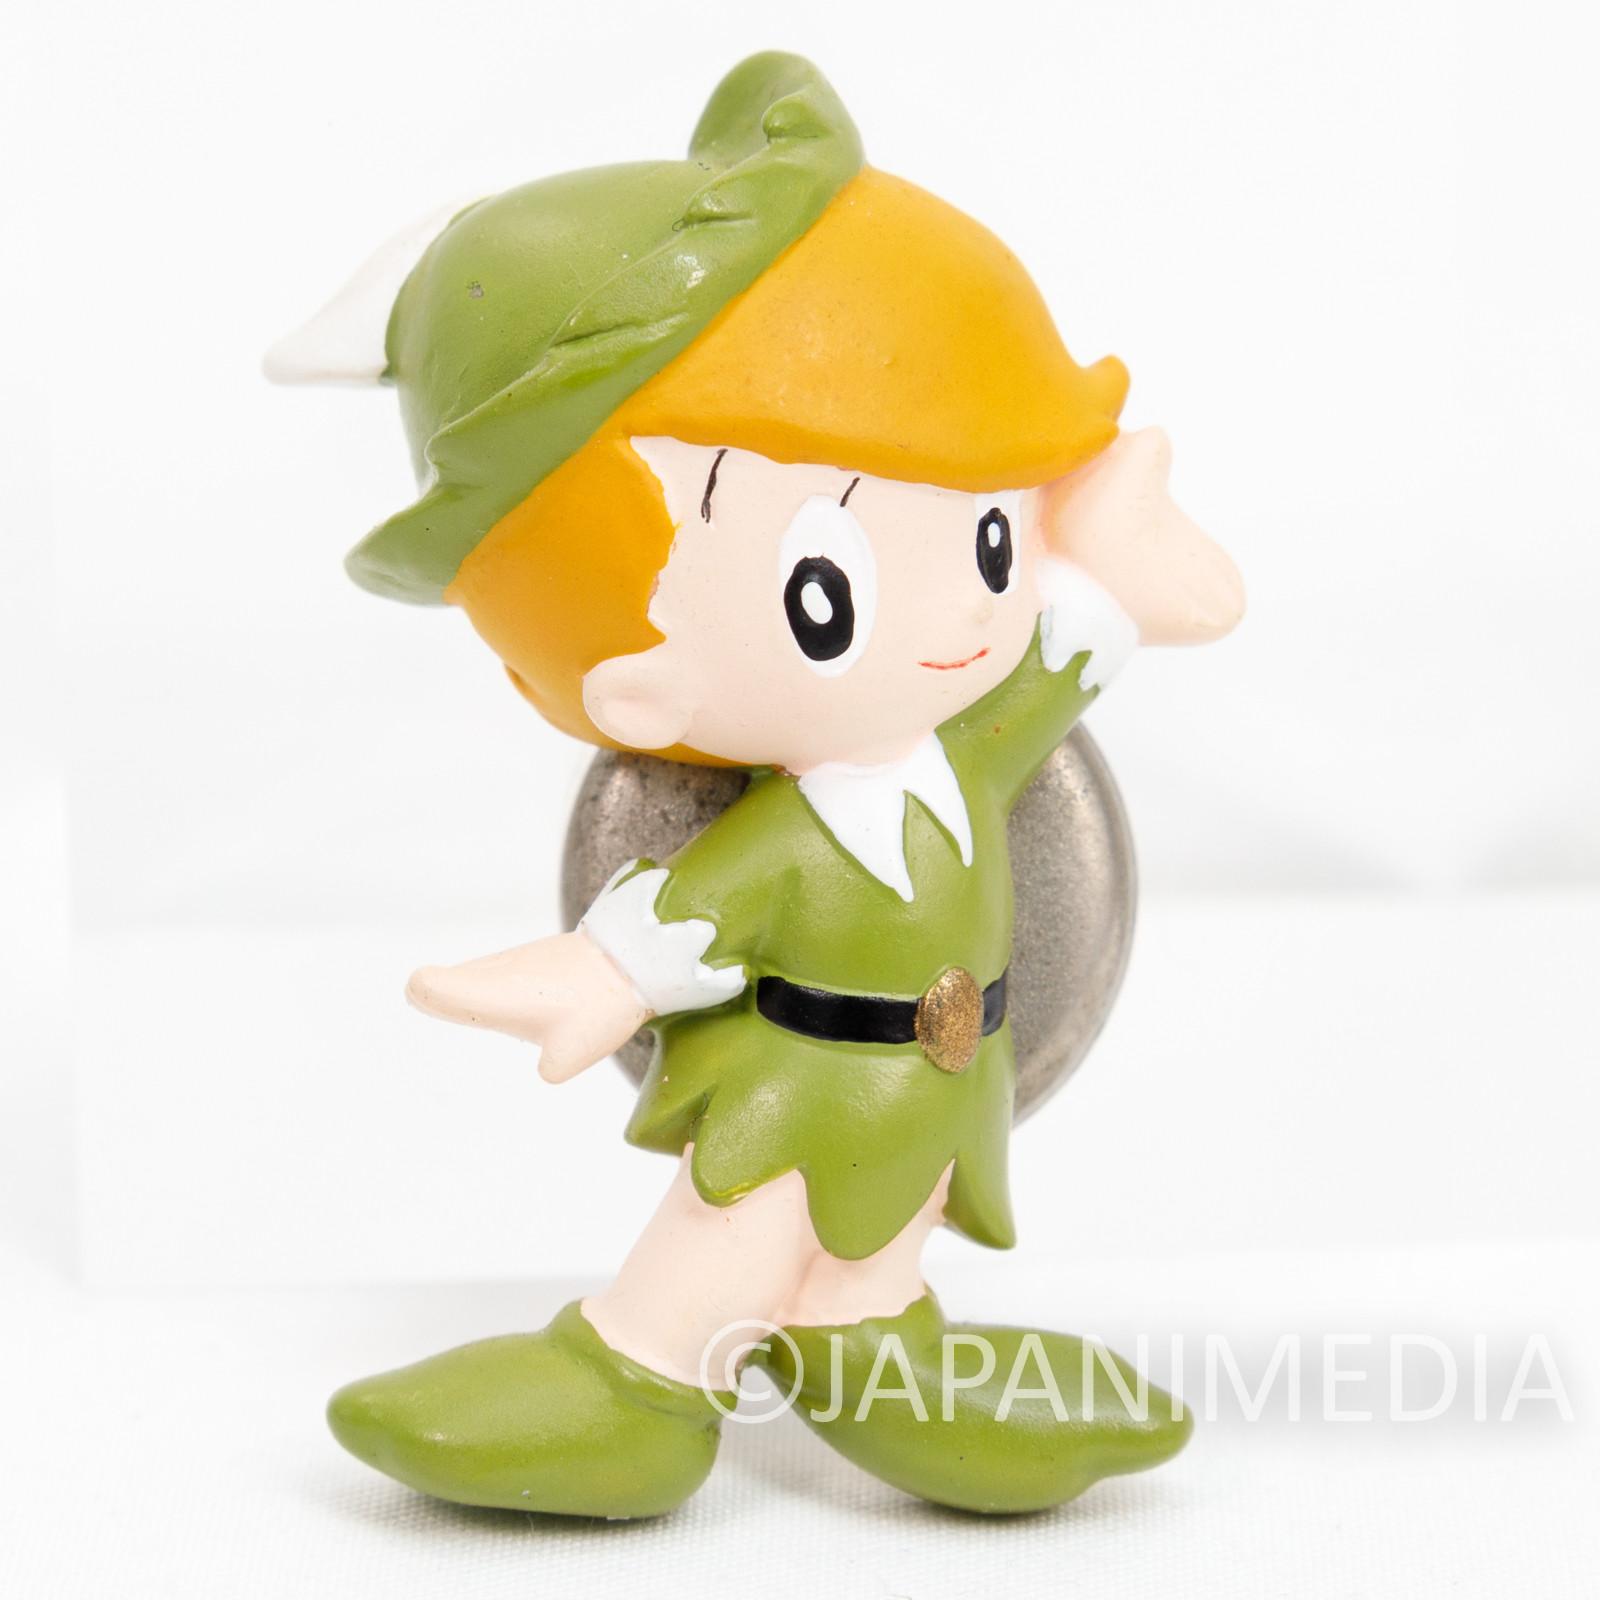 Retro RARE! Princess Knight Tink Mascot Figure Magnet Osamu Tezuka JAPAN